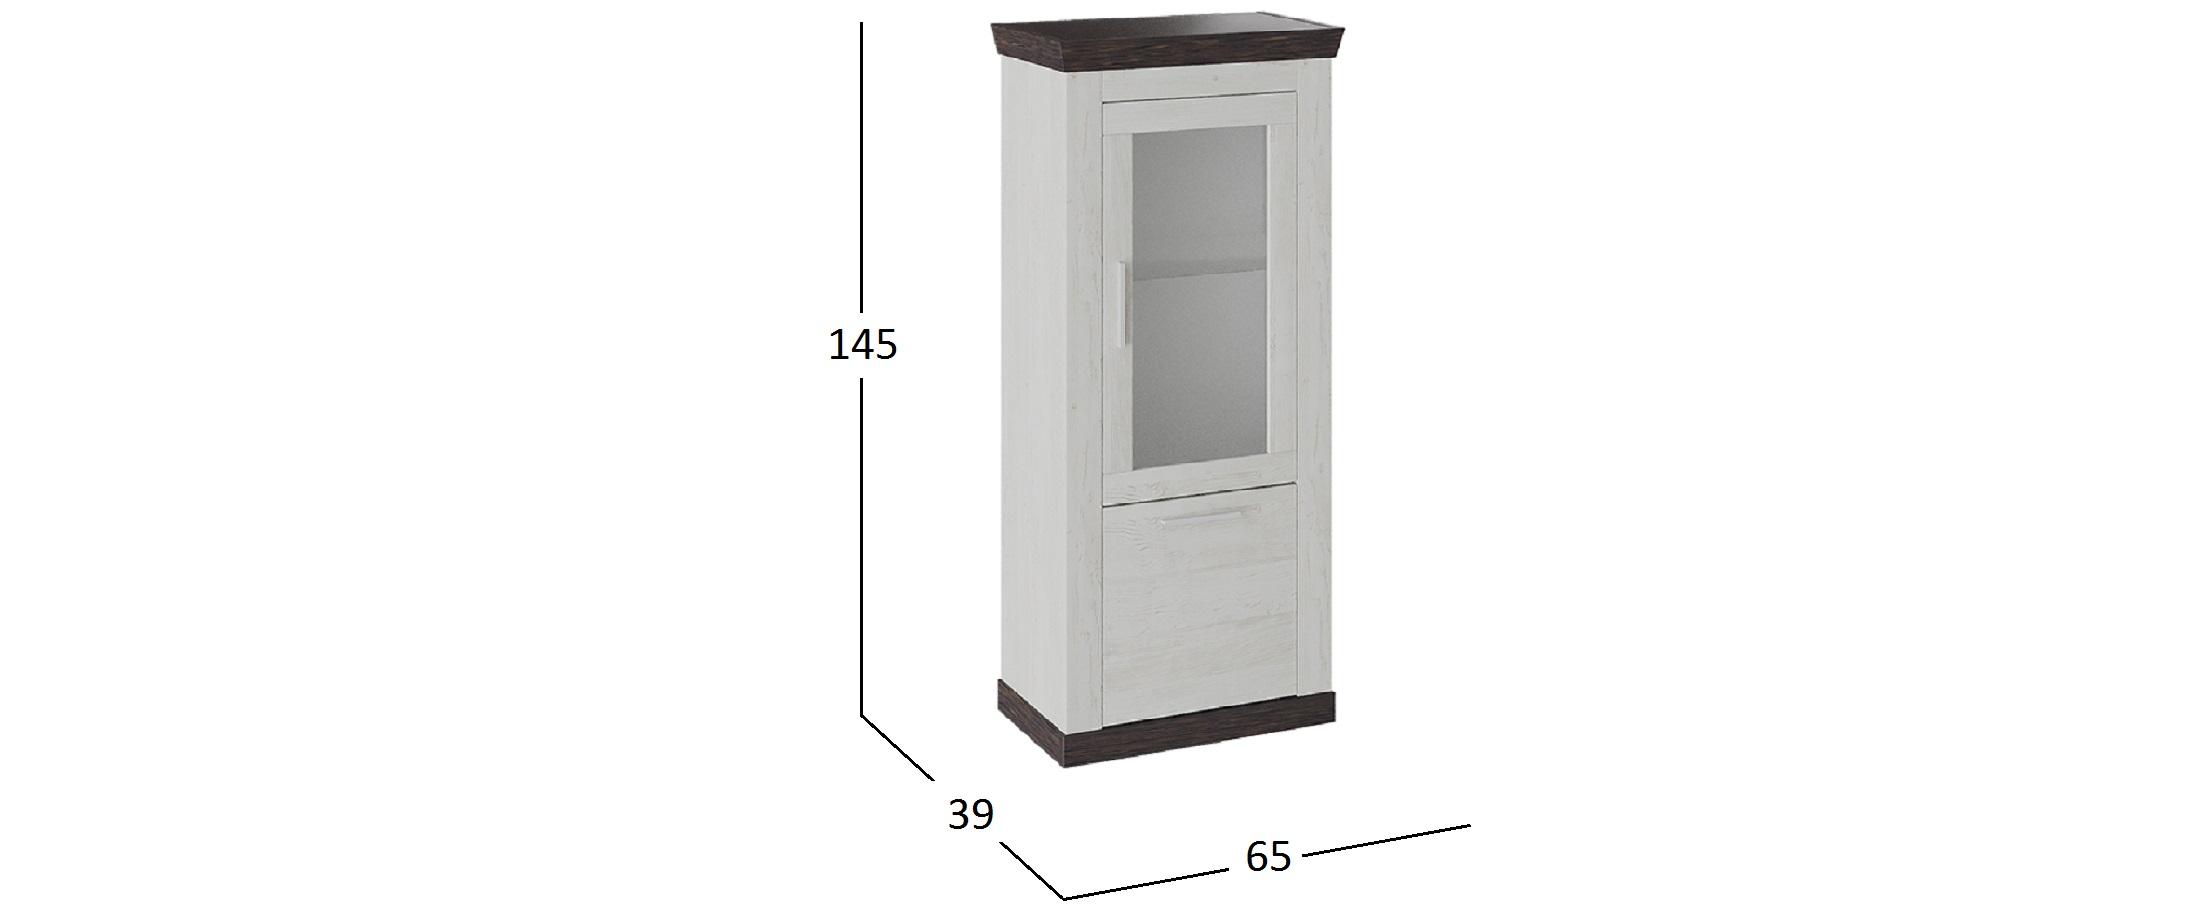 Шкаф Витрина Поланд тип 2 Модель 941